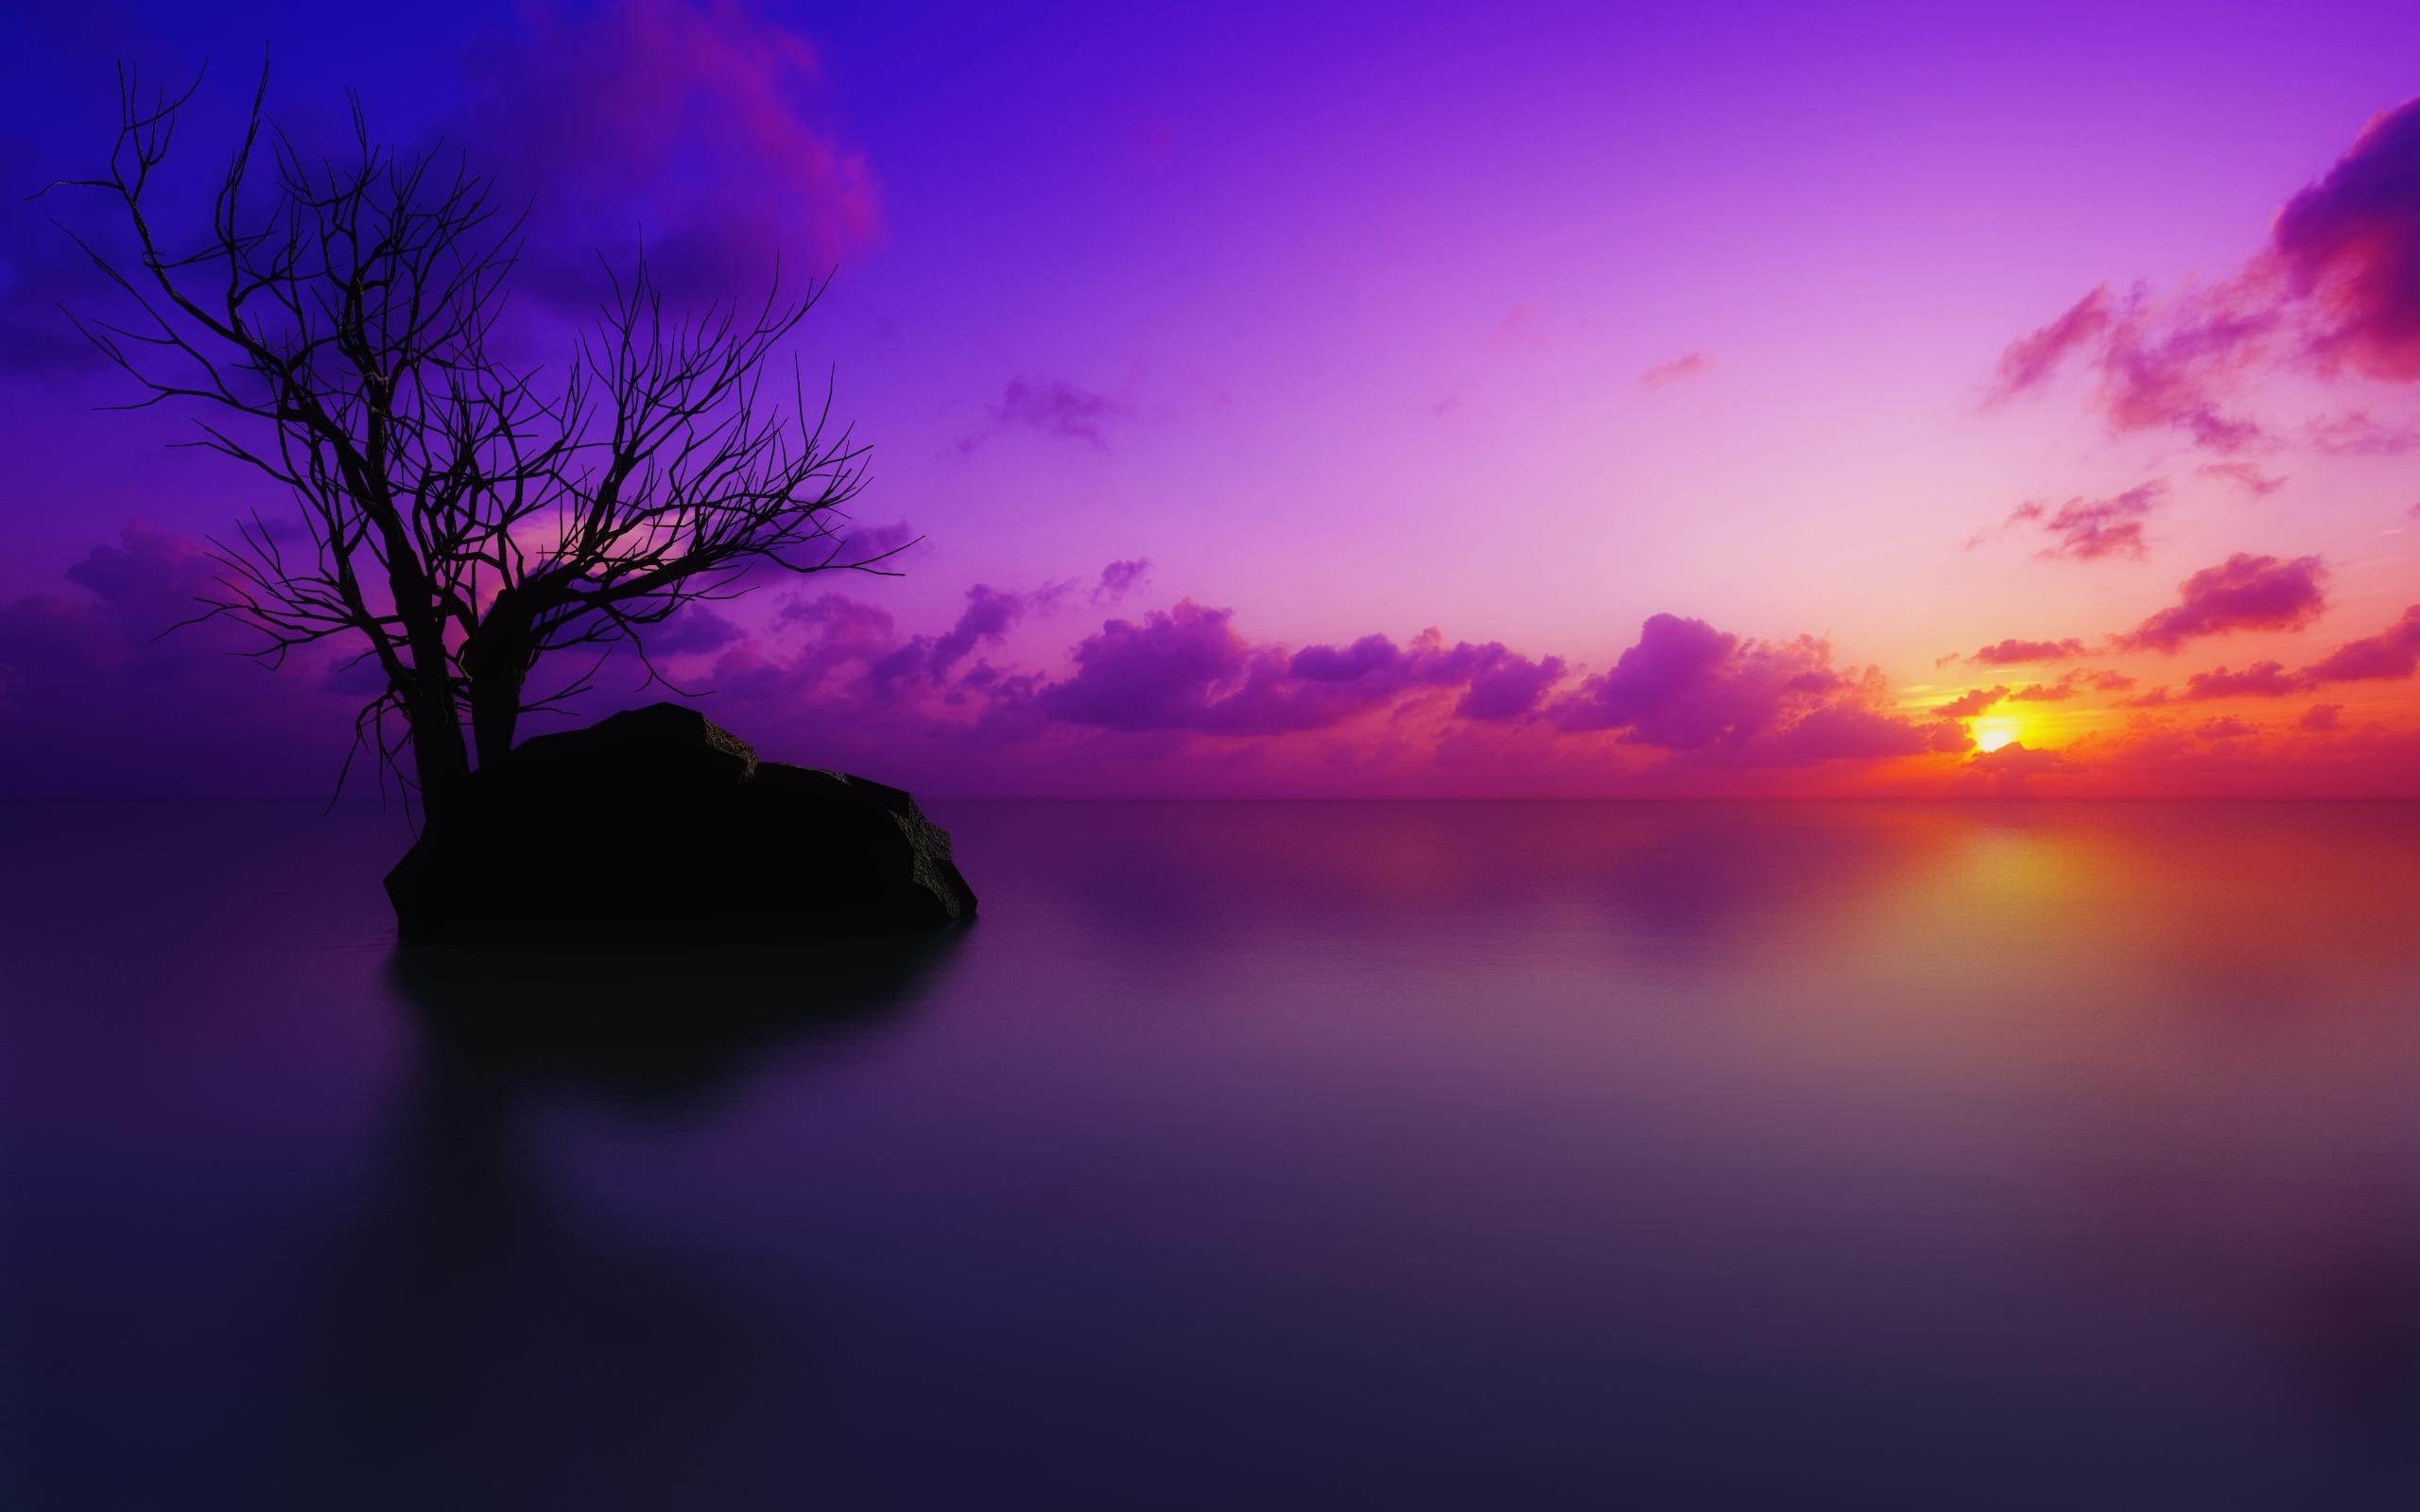 Aarde/Natuur - Scenic  Sunset Ocean Pastel Tree Artistic Purple Cloud Rock Wallpaper